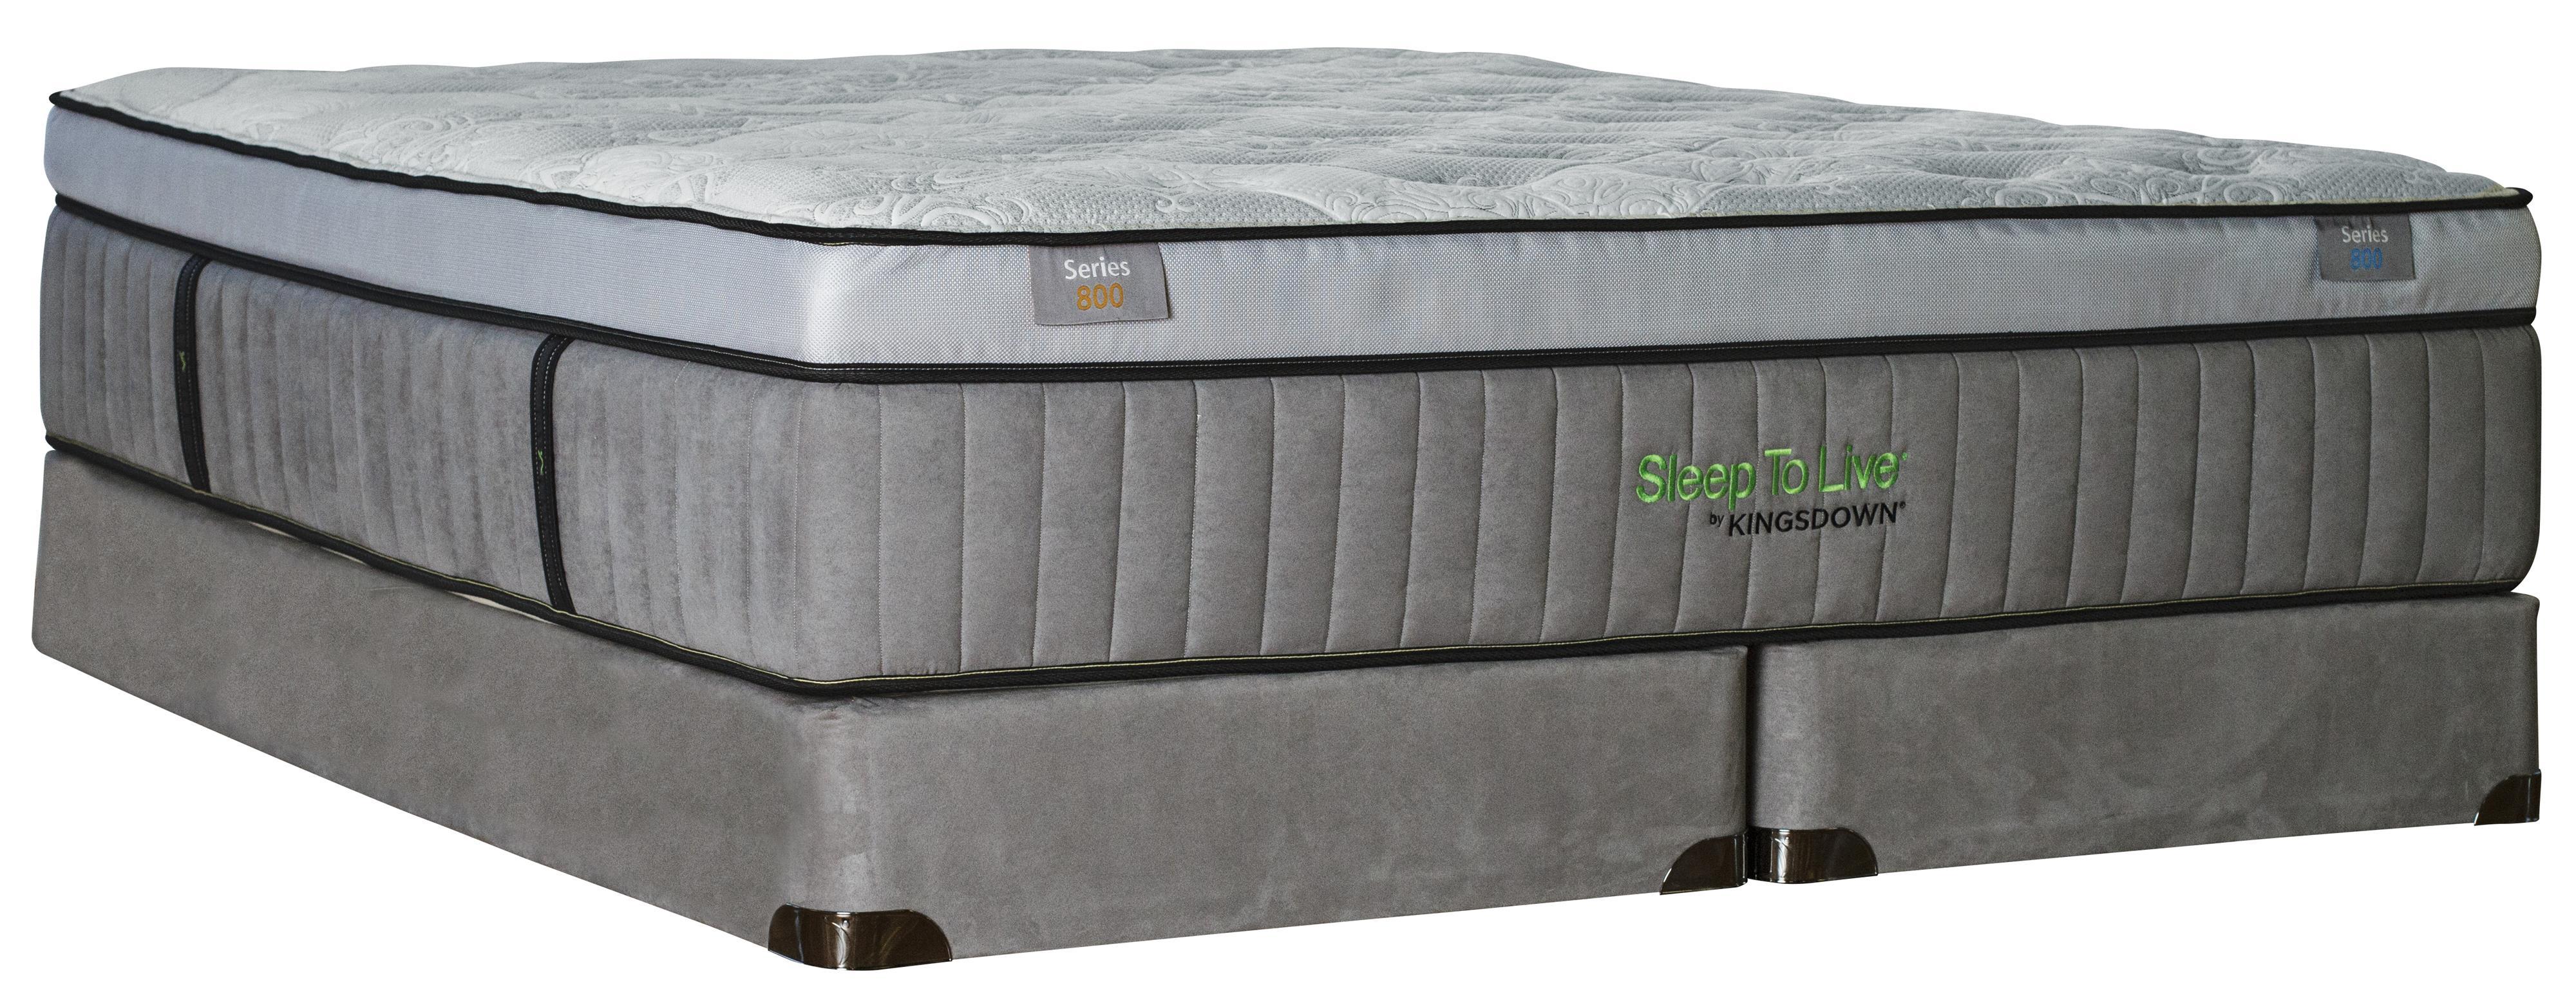 Kingsdown Sleep to Live 800 King Luxurios Box Top Mattress Set - Item Number: Series800-K+2x1128SFH-TXL